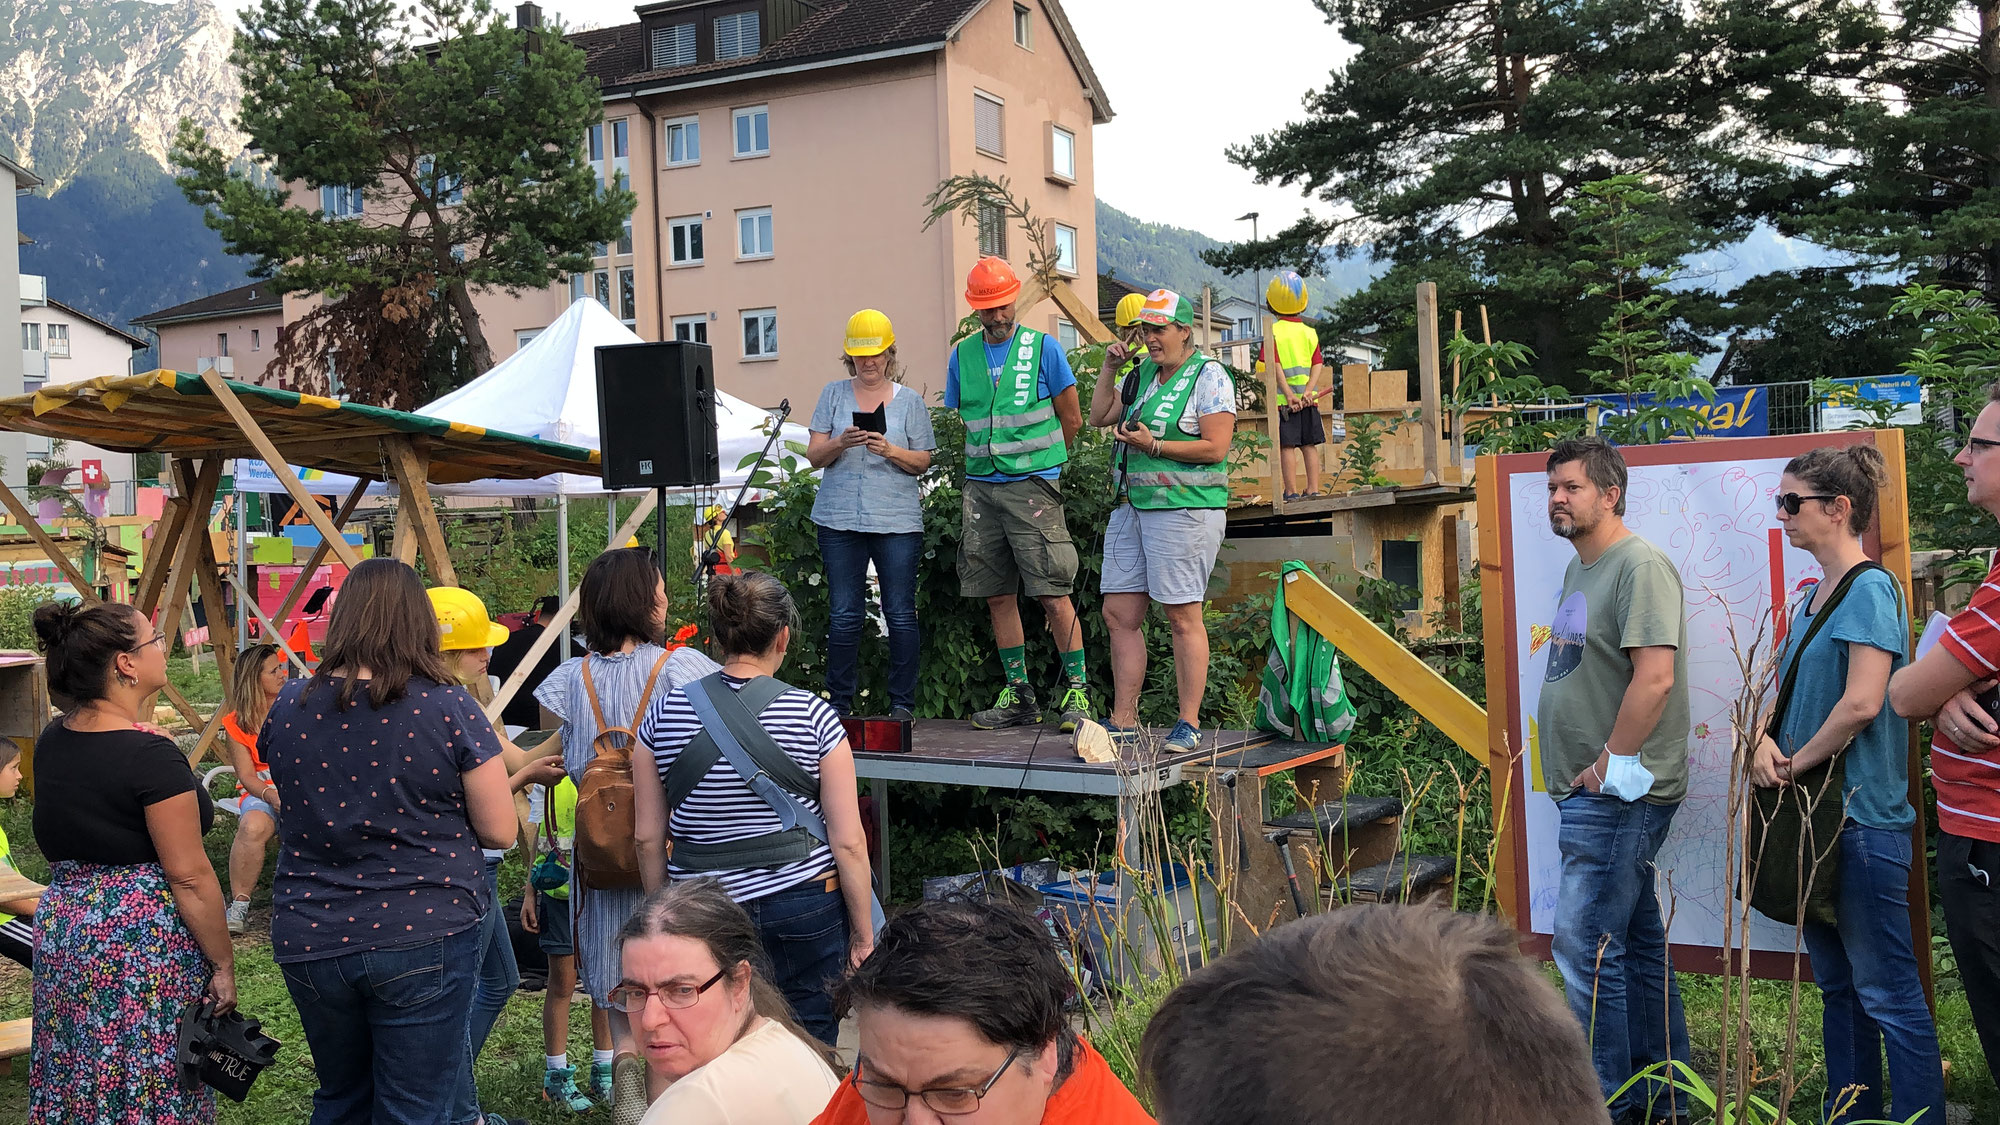 Tolles Aufrichte-Fest